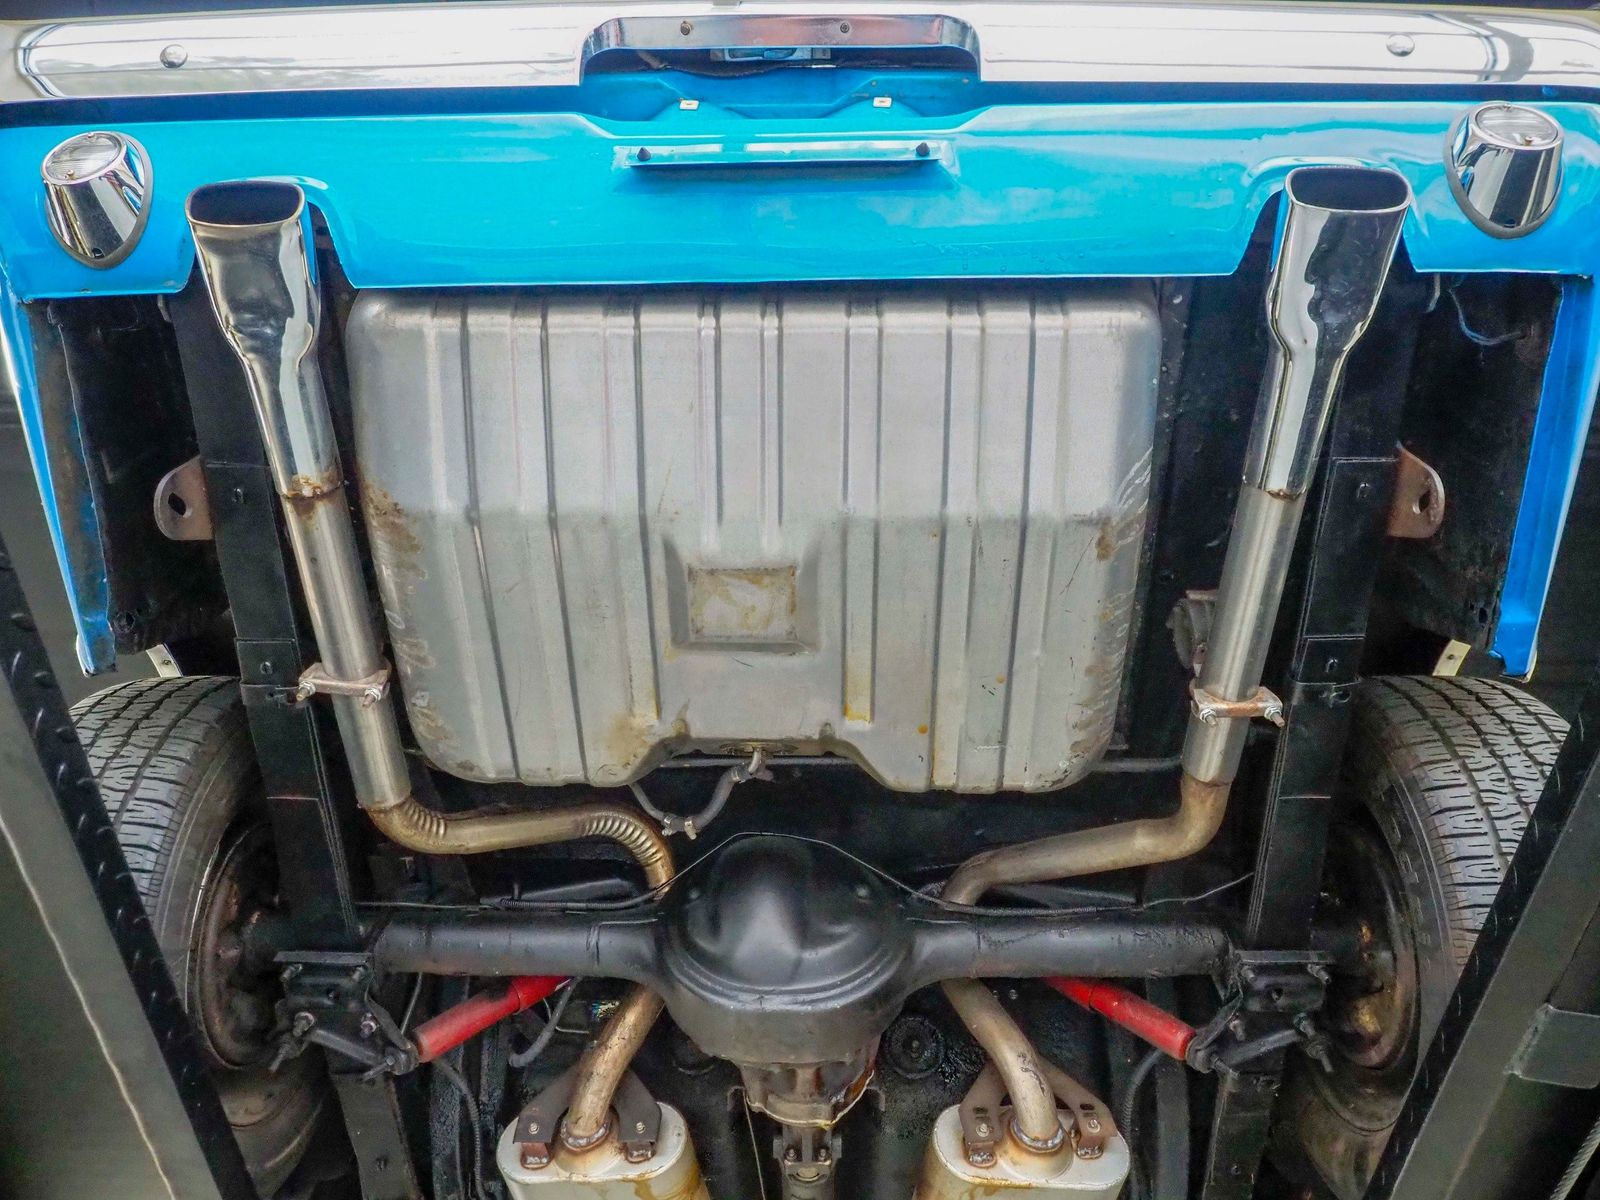 1970 Ford Mustang Mach 1 Mach 1 Grabber Blue 4 Speed White